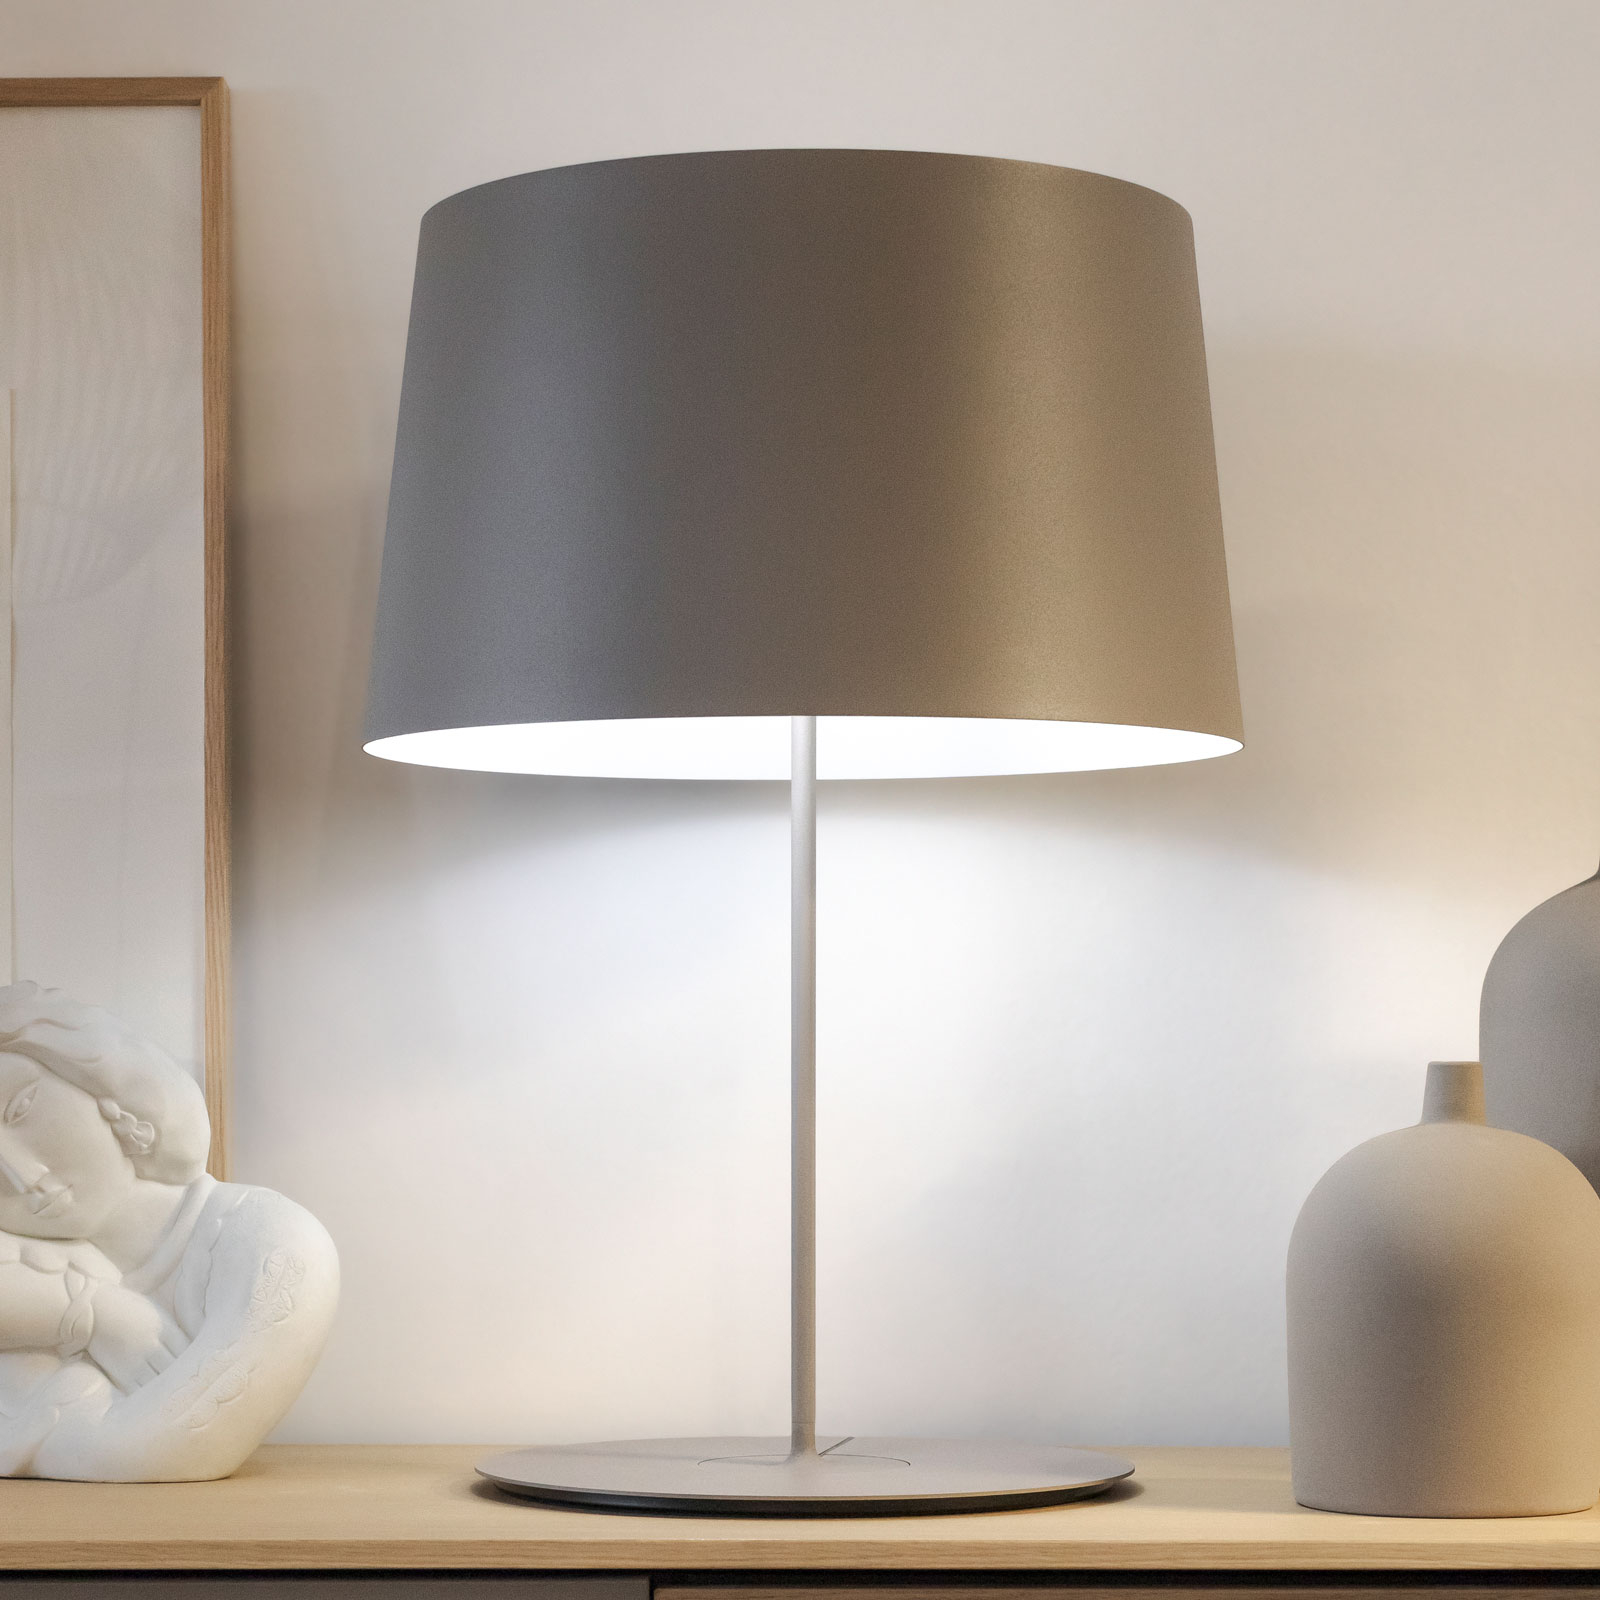 Vibia Warm 4901 lampe à poser, Ø 42cm, beige